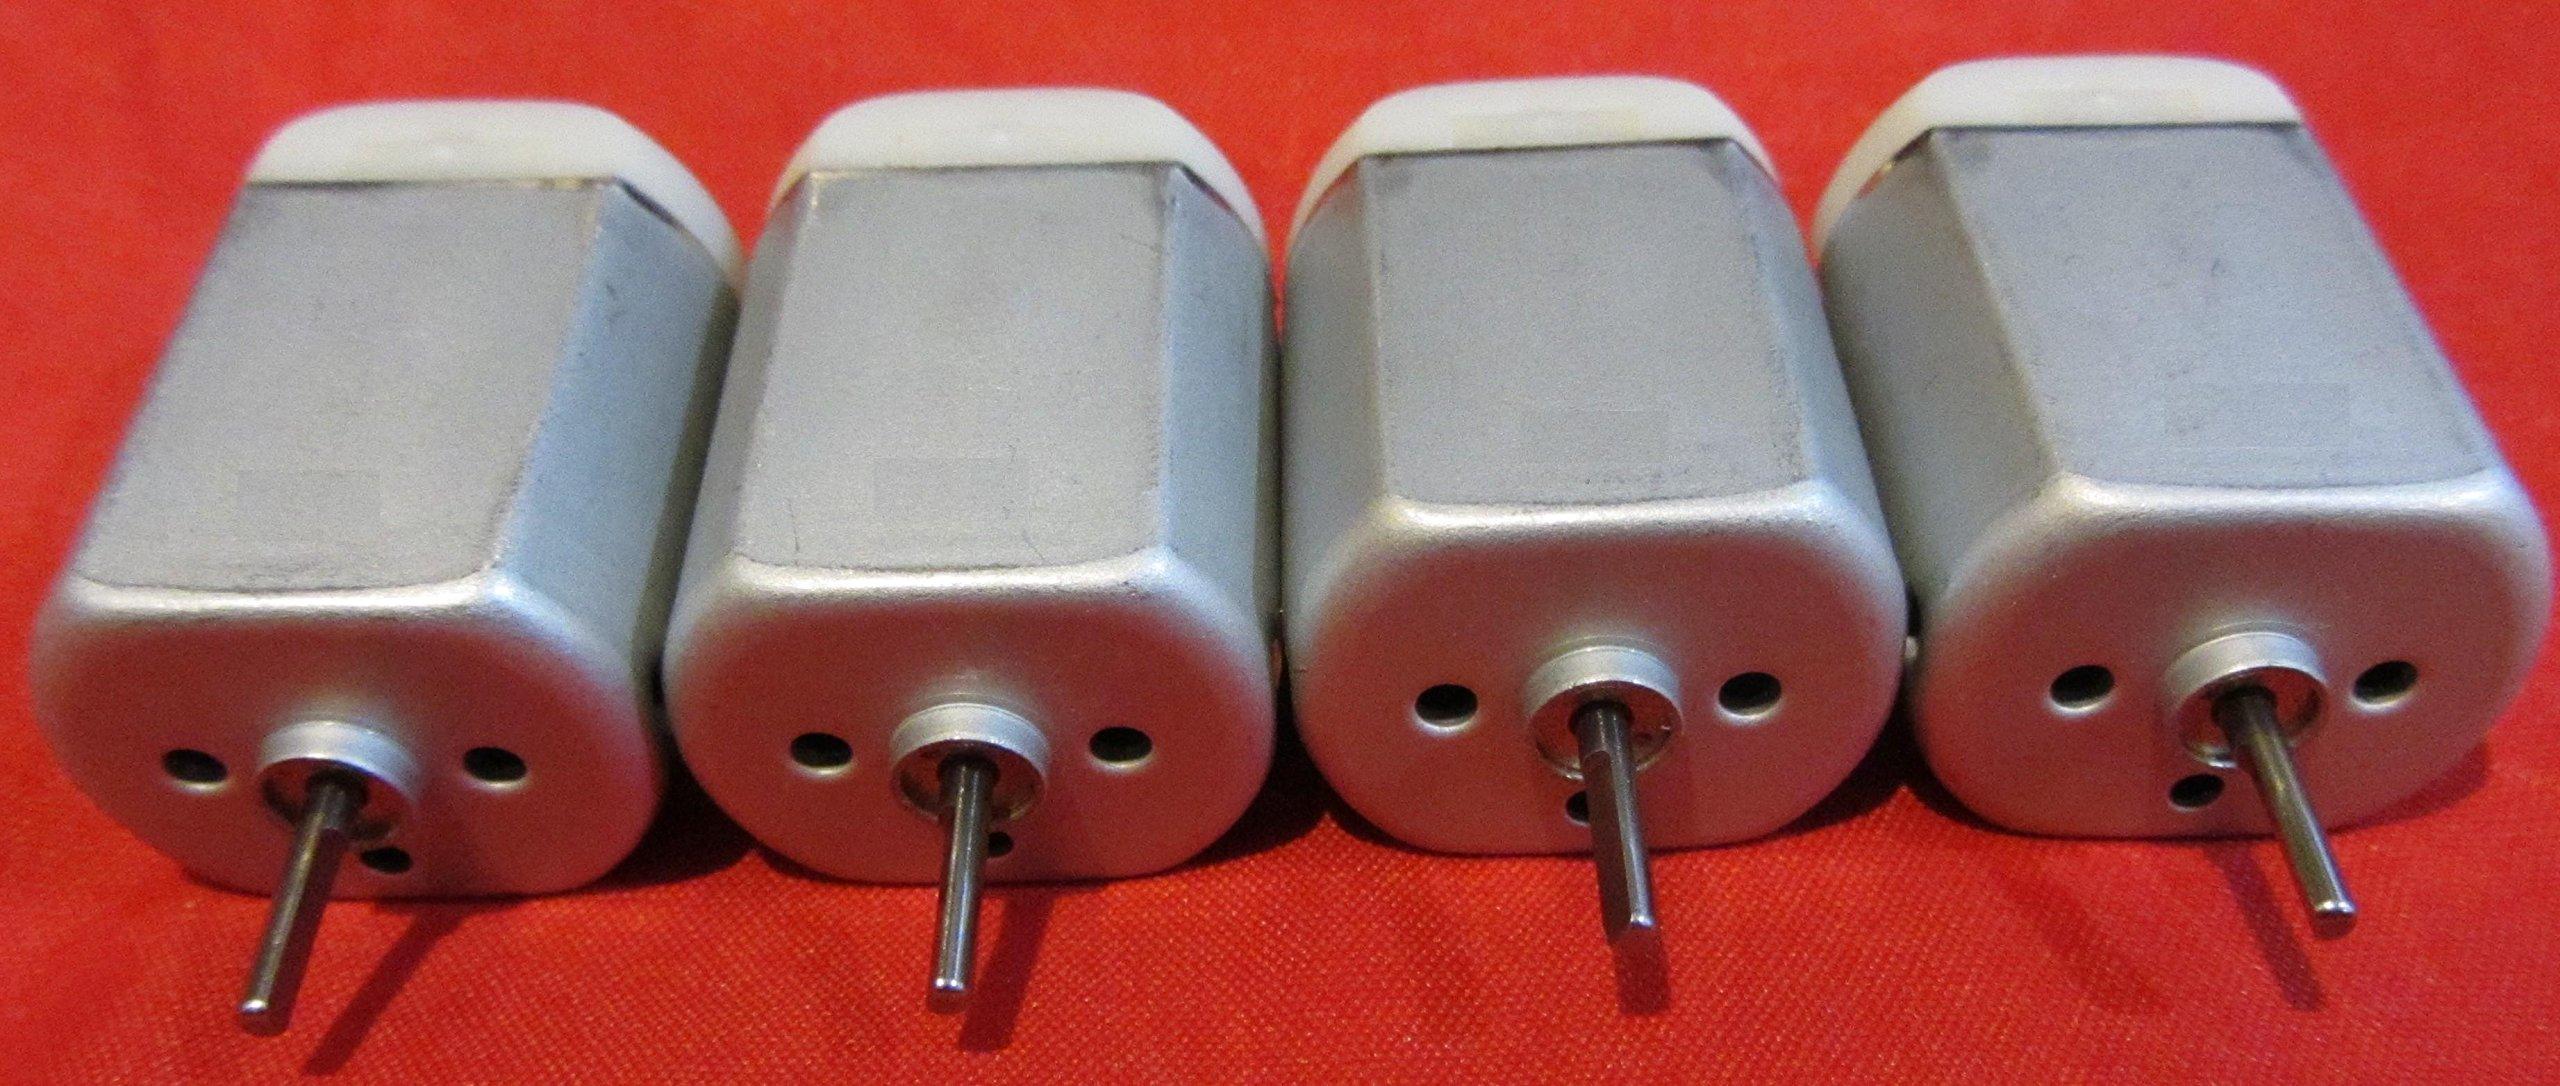 4 Pack - 10mm Flat Shaft Central Door Lock Actuator Motor FC-280PC-22125 FLAT SHAFT, D Spindle, Power Locking Repair Engine